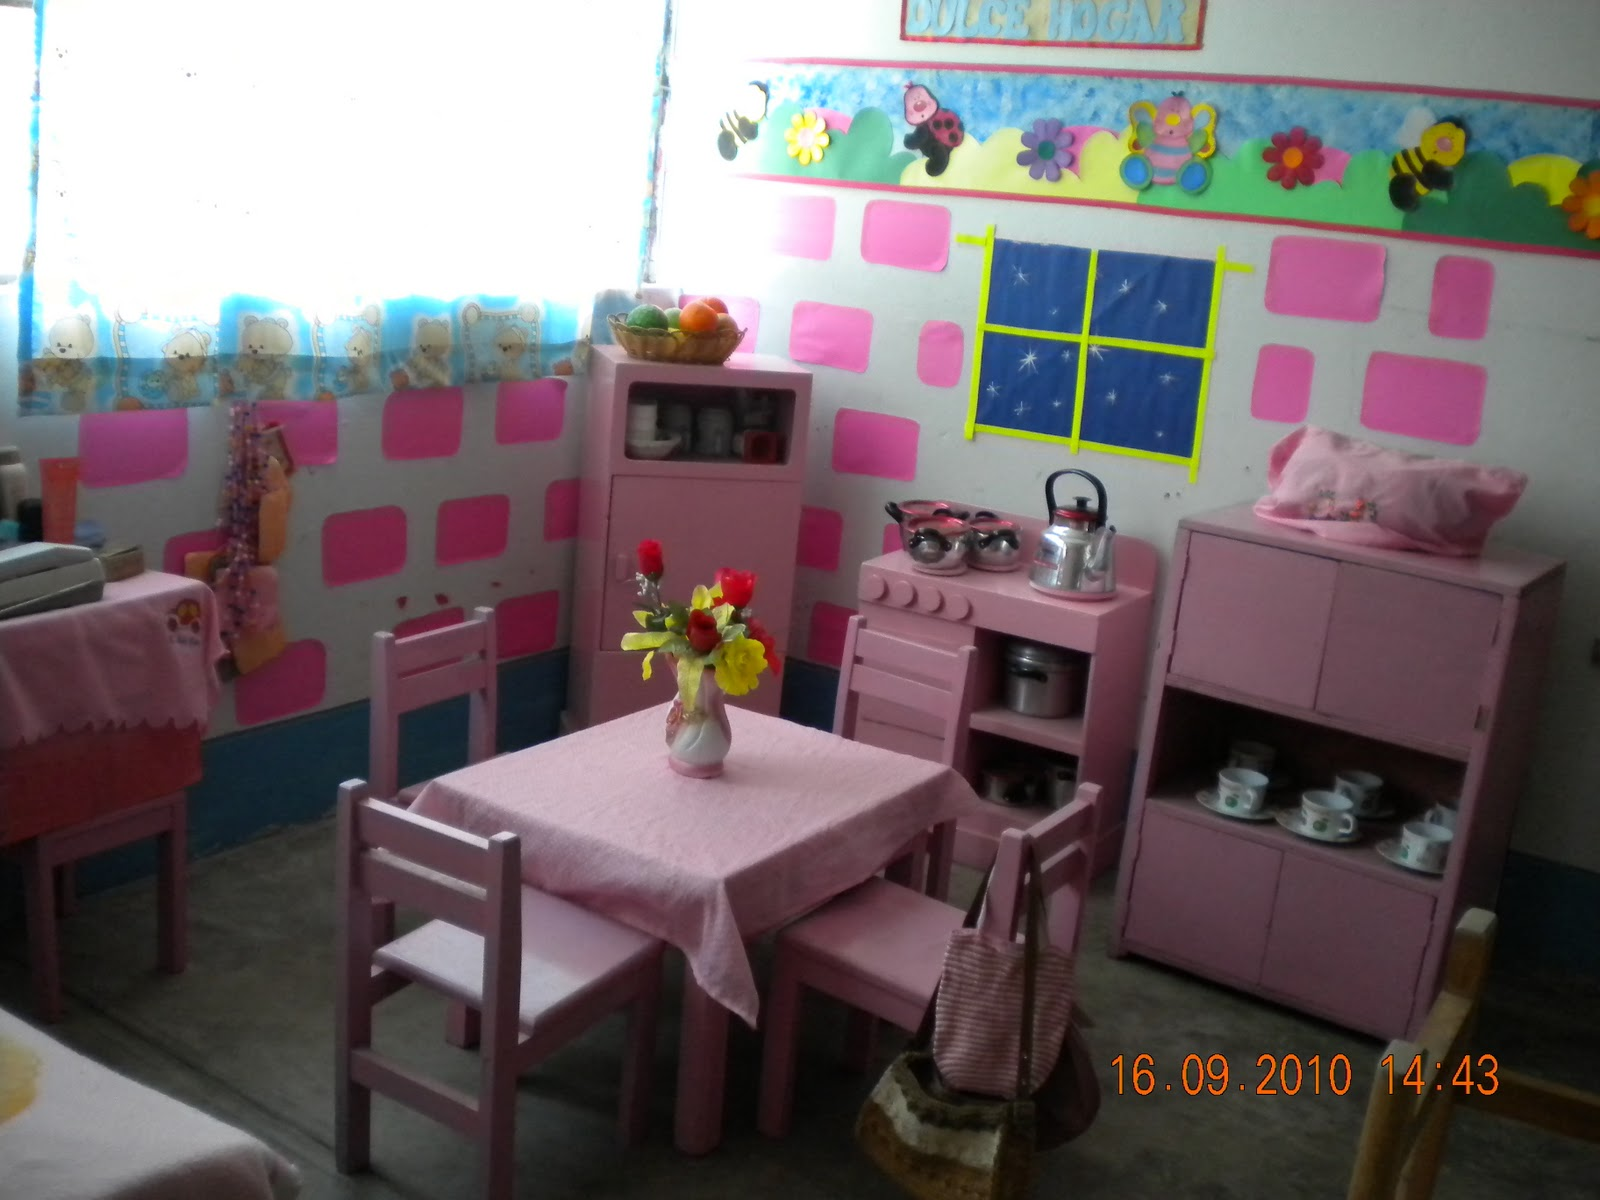 Cuna jardin n 630 juan pablo ii ambientaci n del aula for Como decorar el hogar